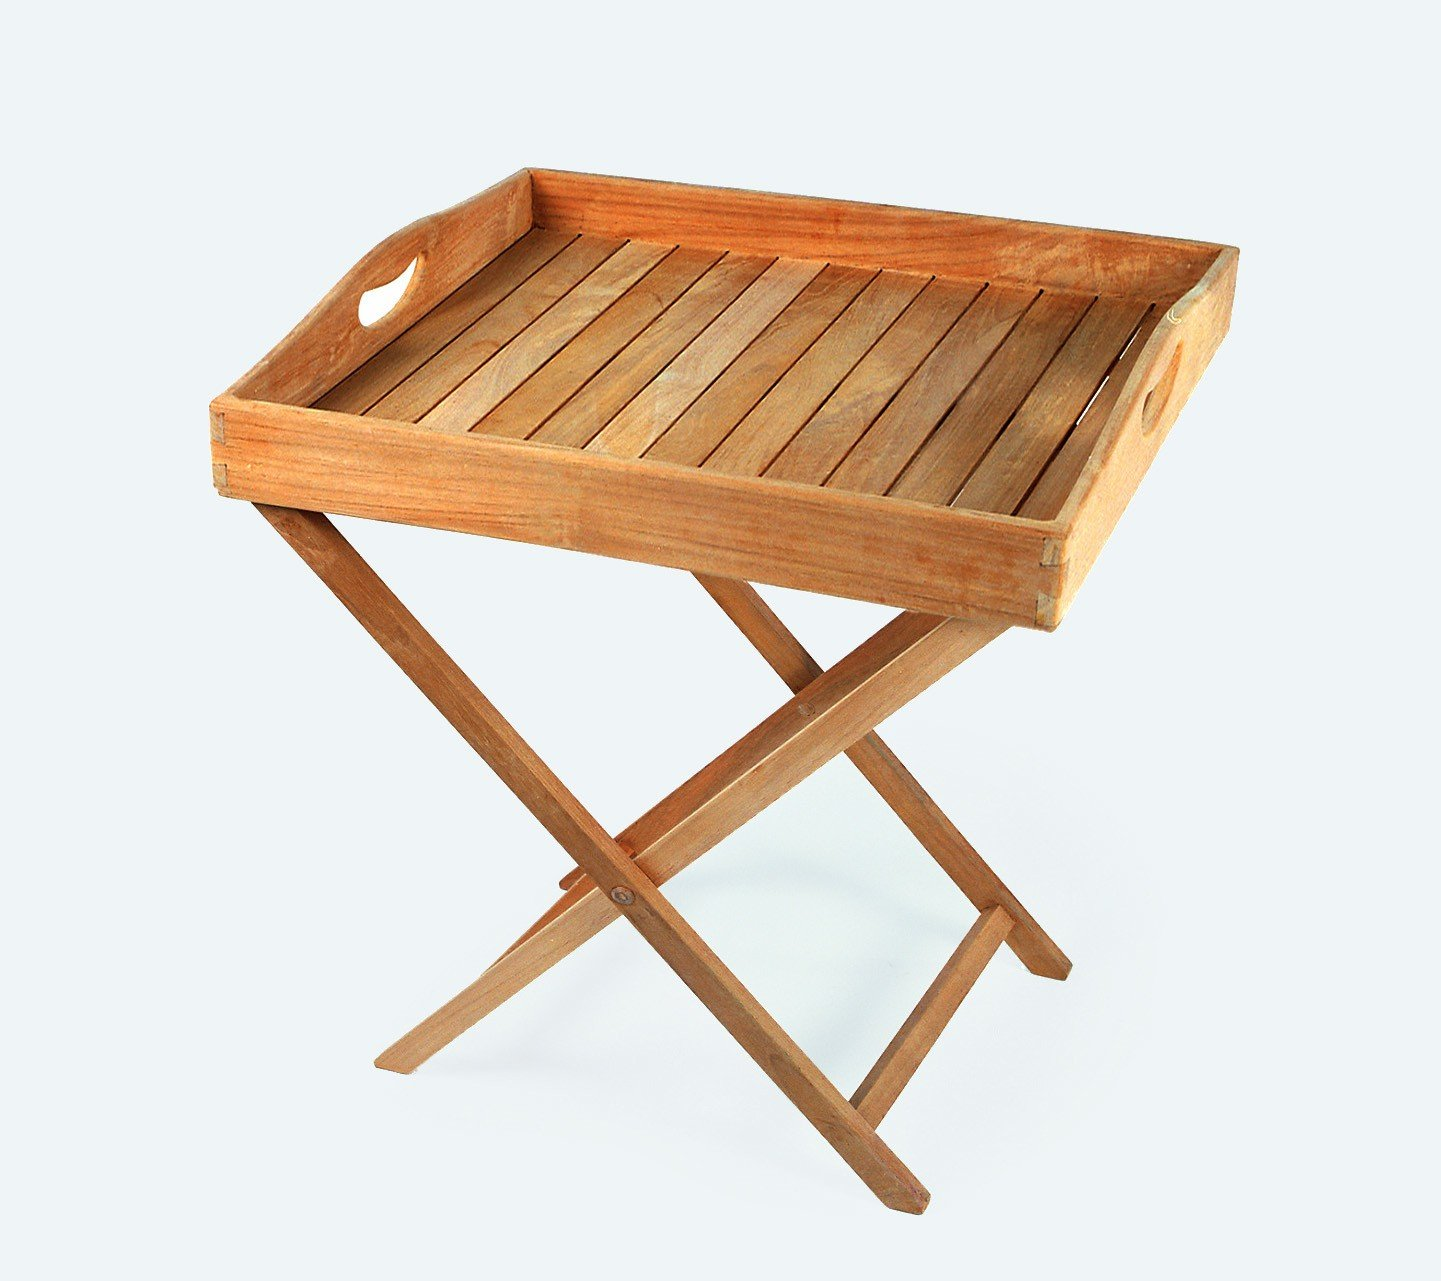 Tablett mit Gestell Beistelltisch Tisch Gartentisch aus Teakholz CONNY PLOSS Neu günstig